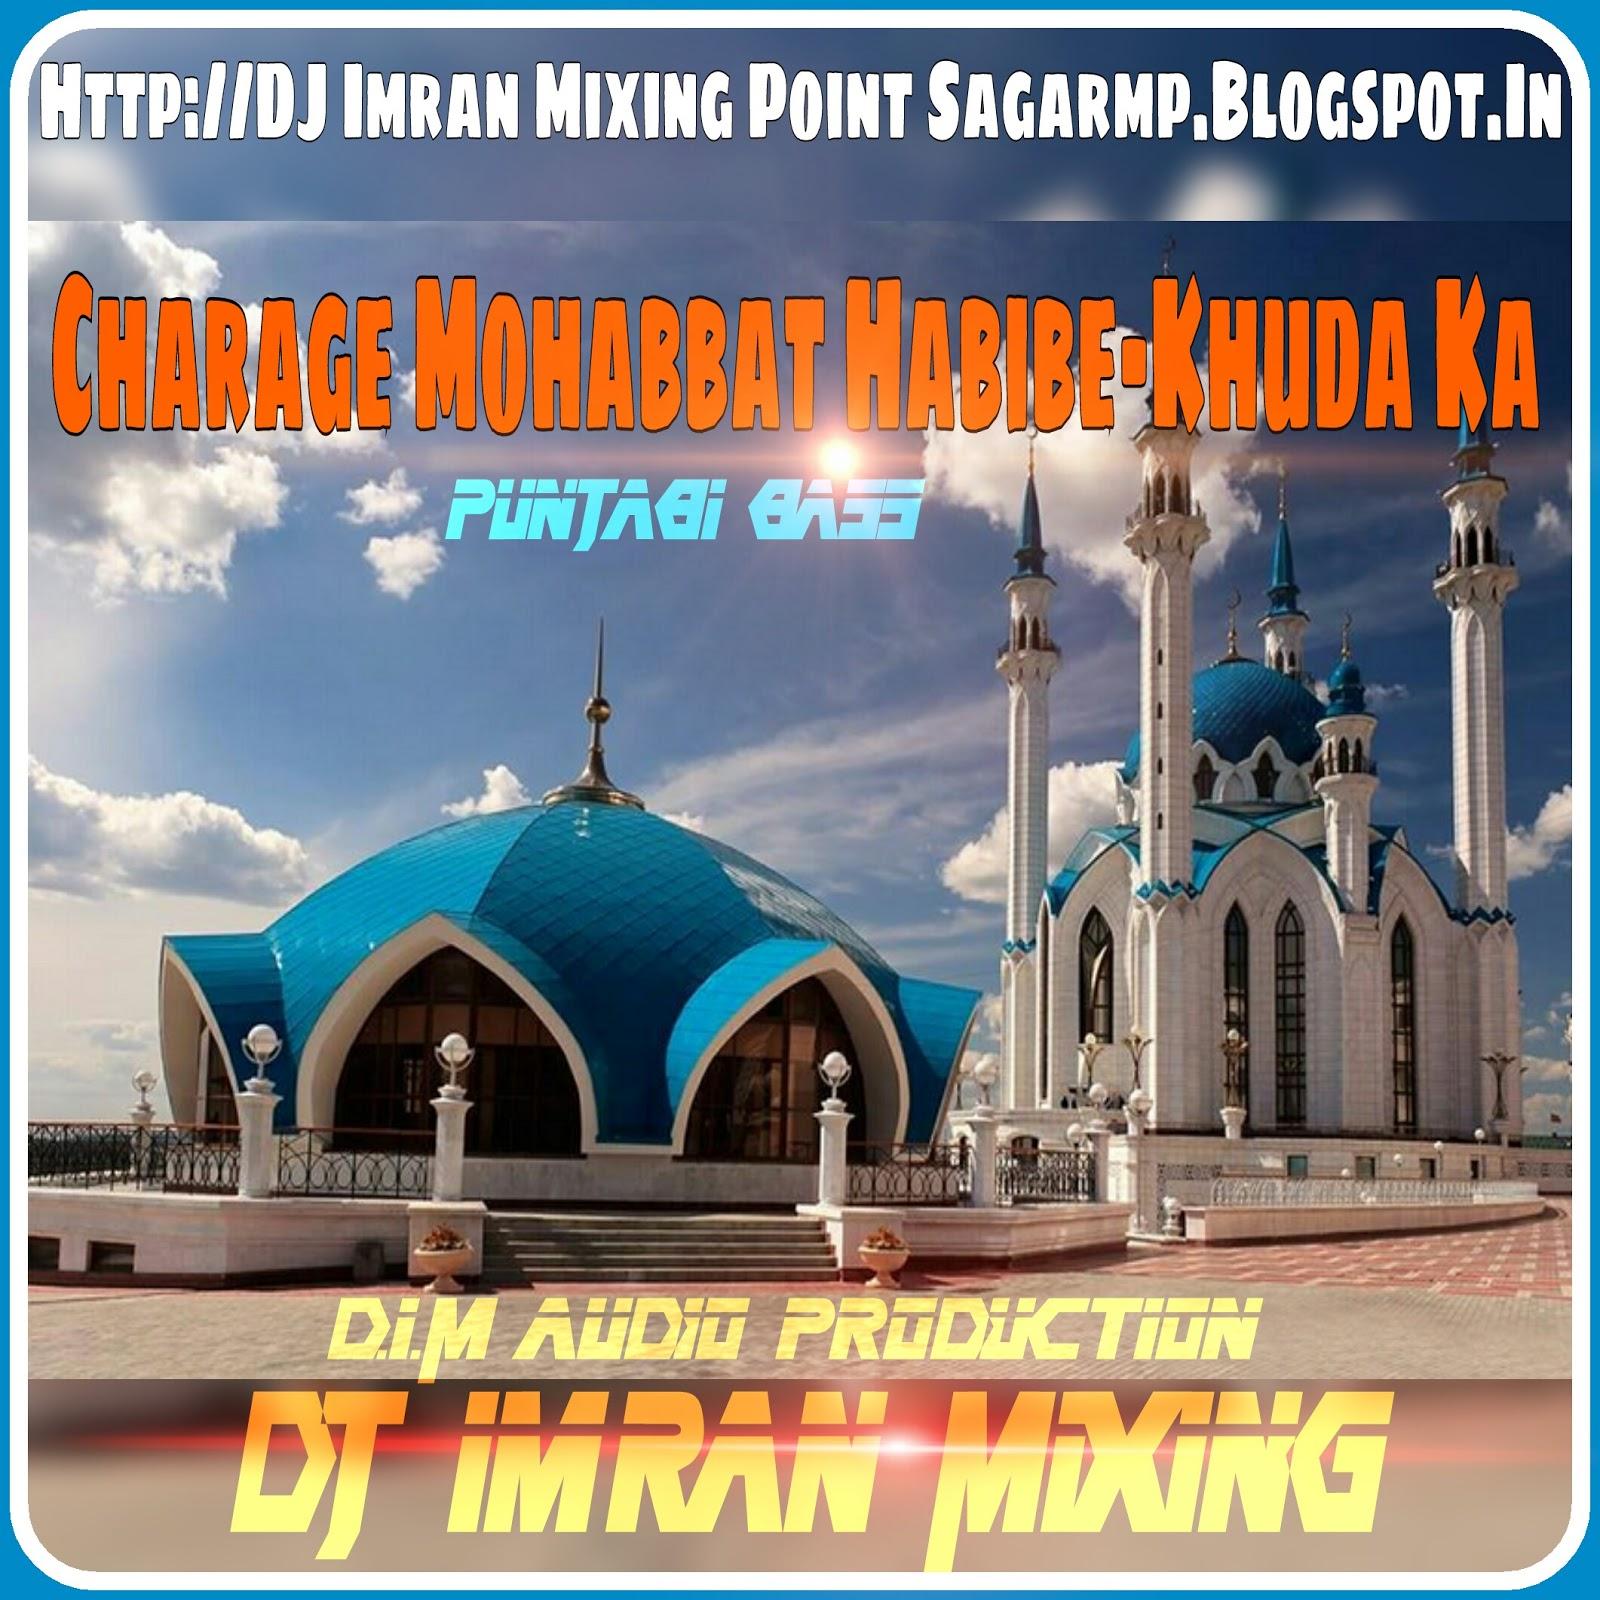 Imran Khan Song I Am Rider Mp3 Download: DJ Imran Mixing_D.I.M Audio Sagar M.P.: Download:-CHARAGE